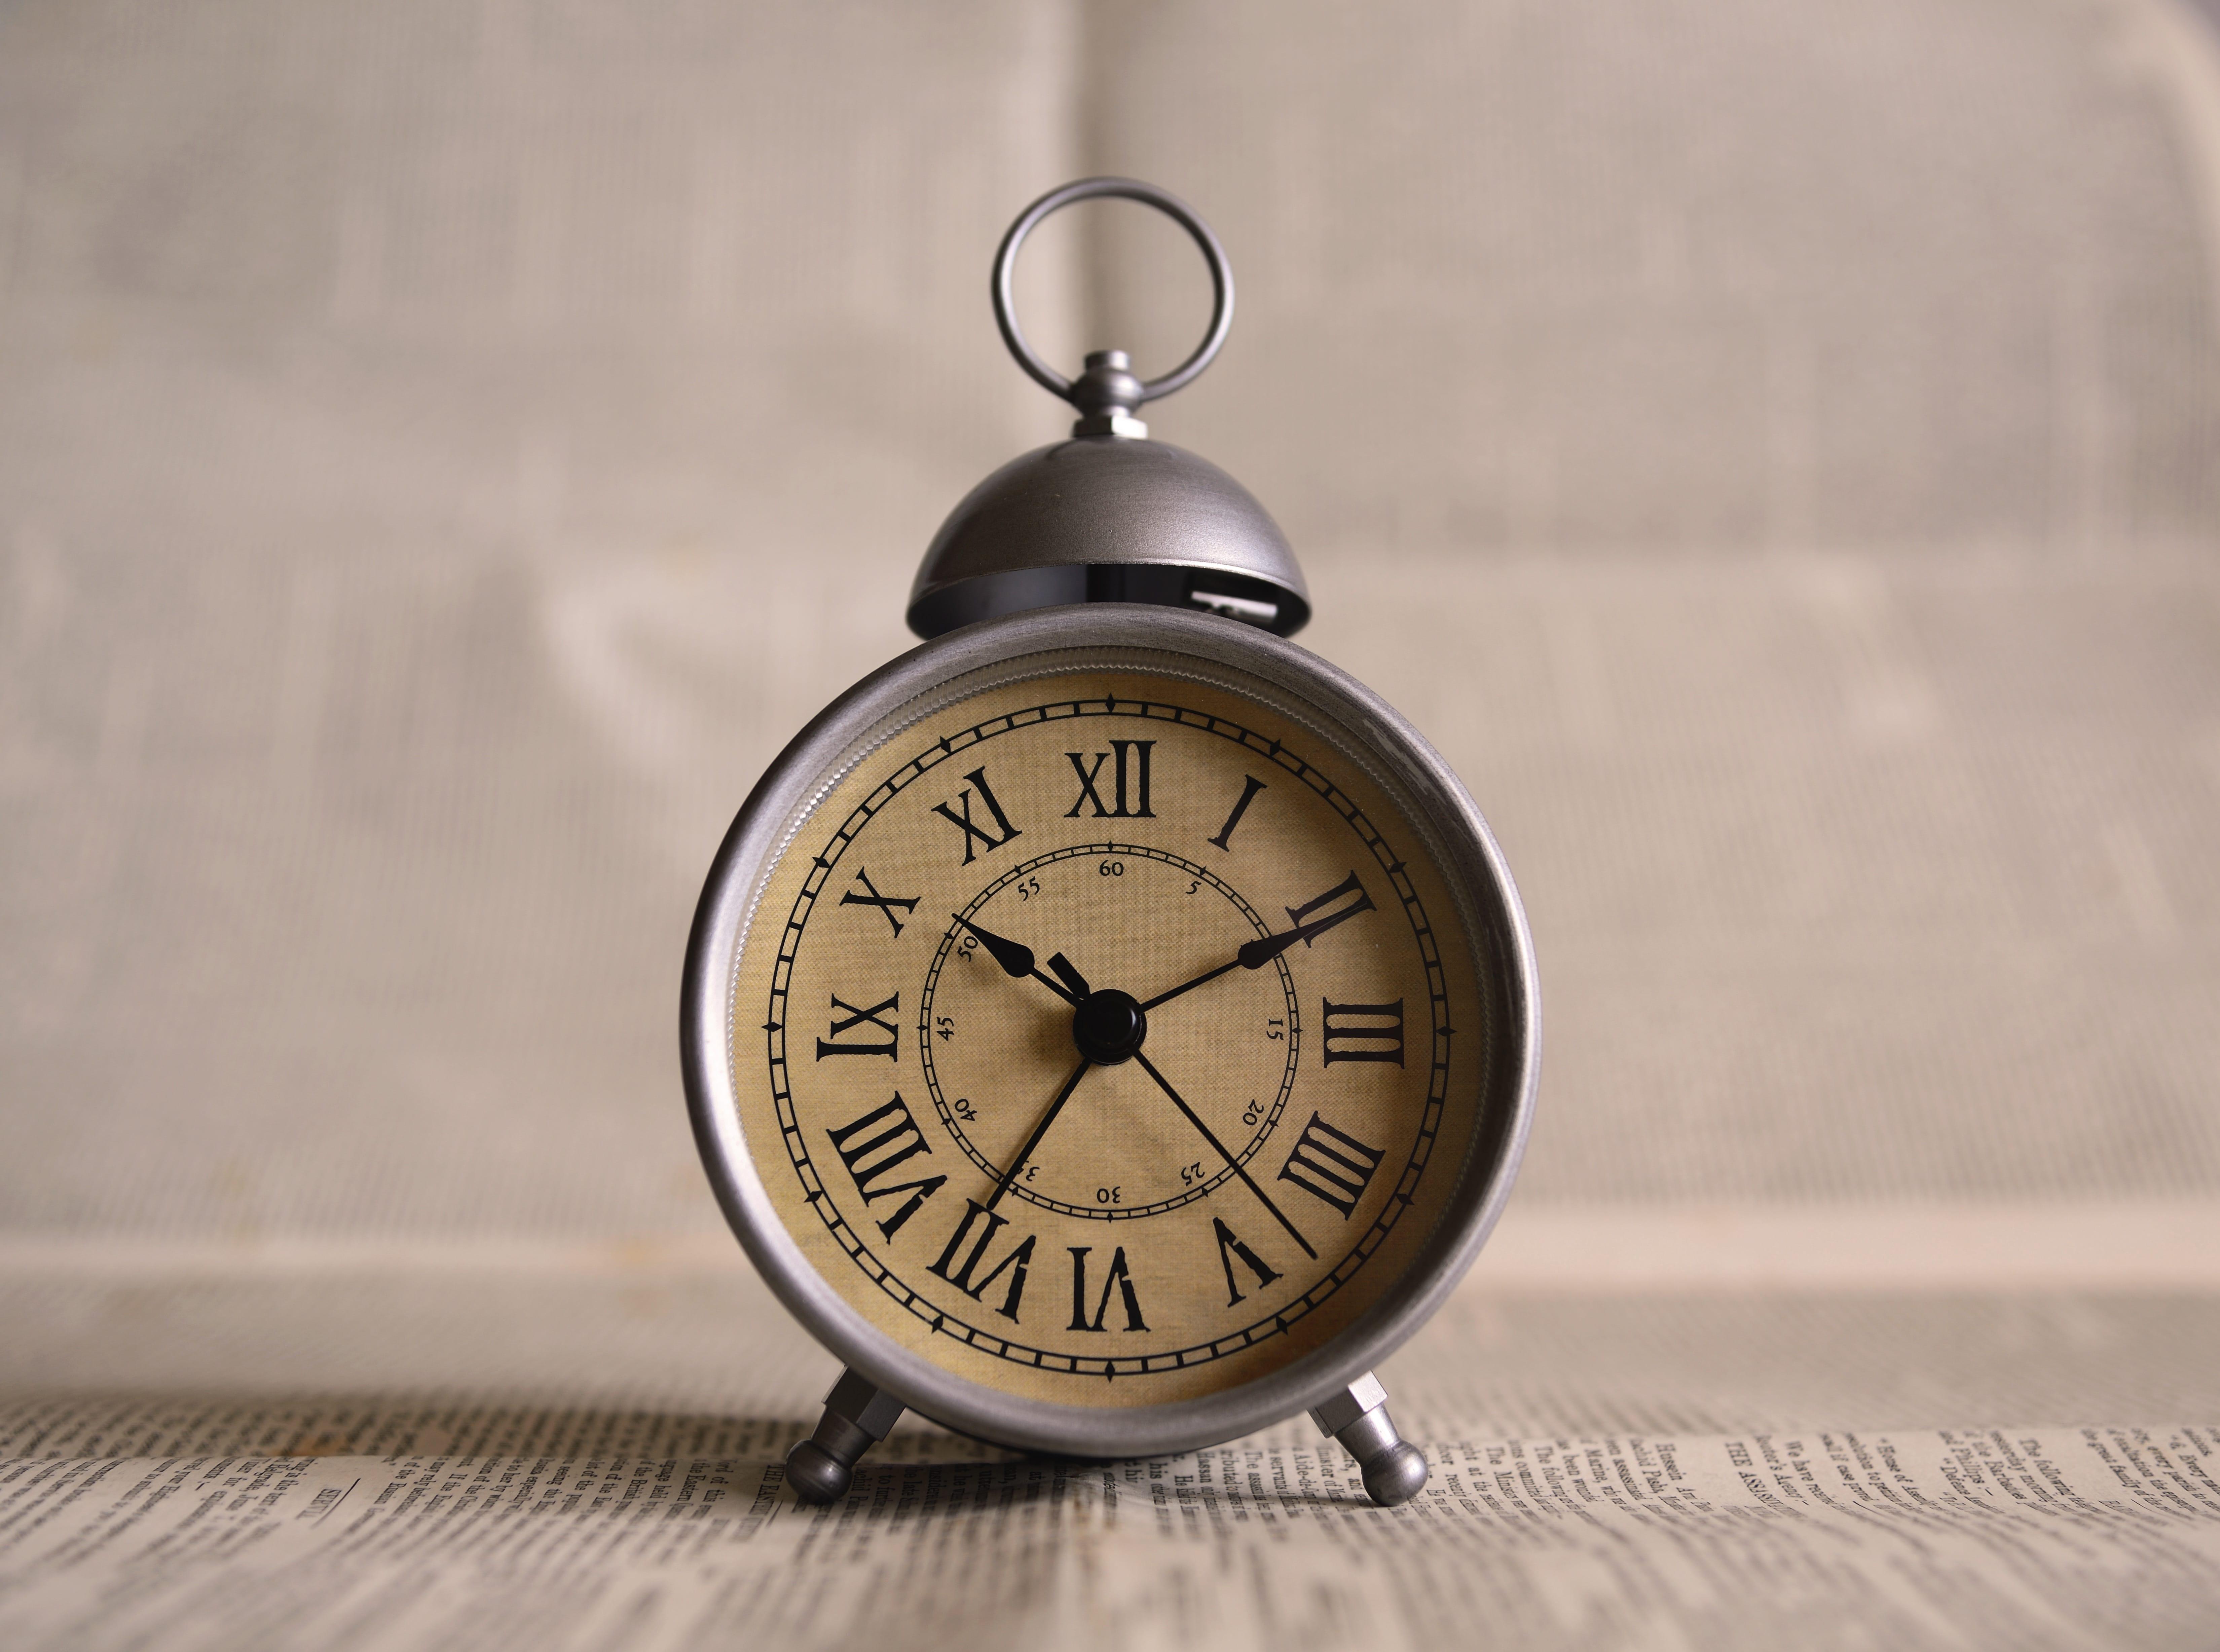 Vintage Alarm Clock | PNL – EMF Health Effects